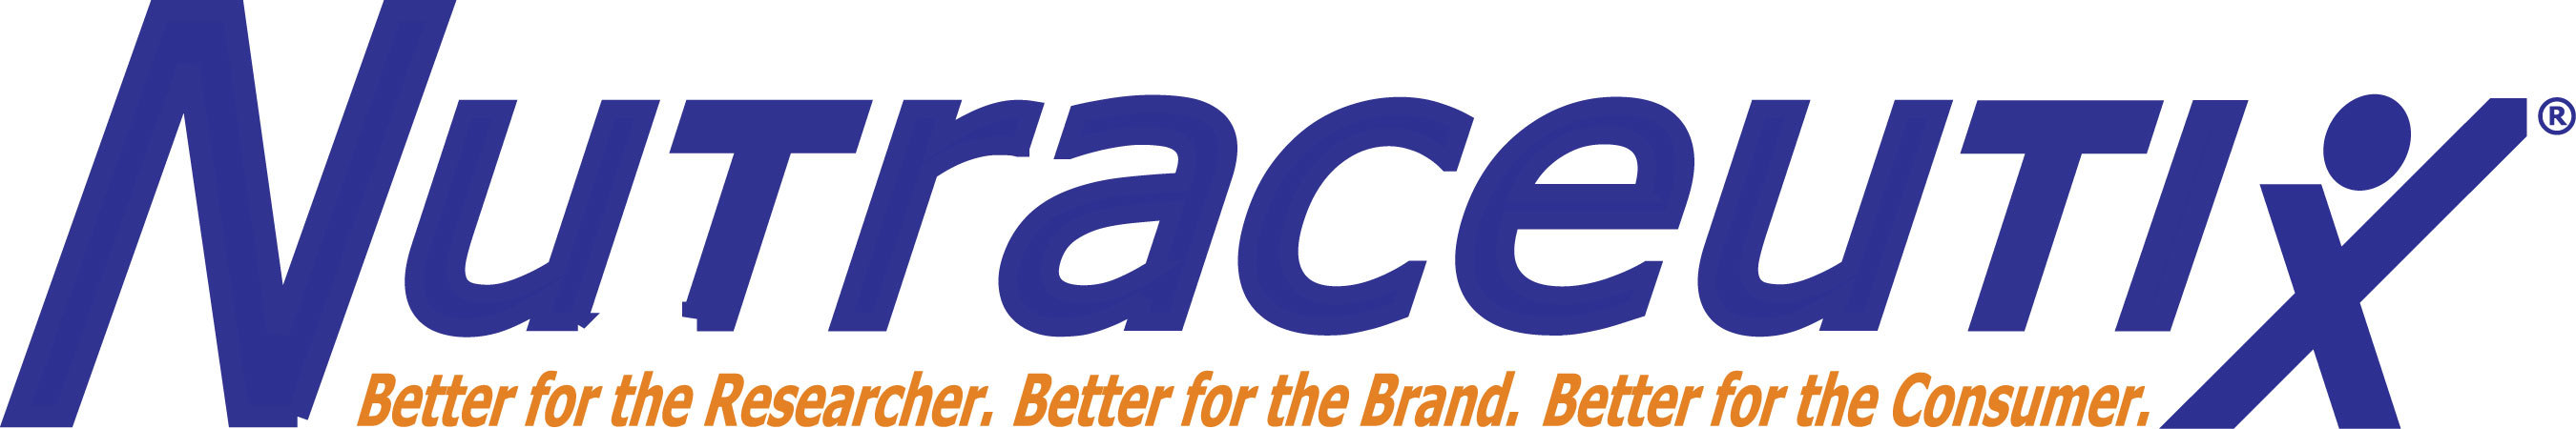 Nutraceutix corporate logo, Redmond, WA, USA, 10-15-11.